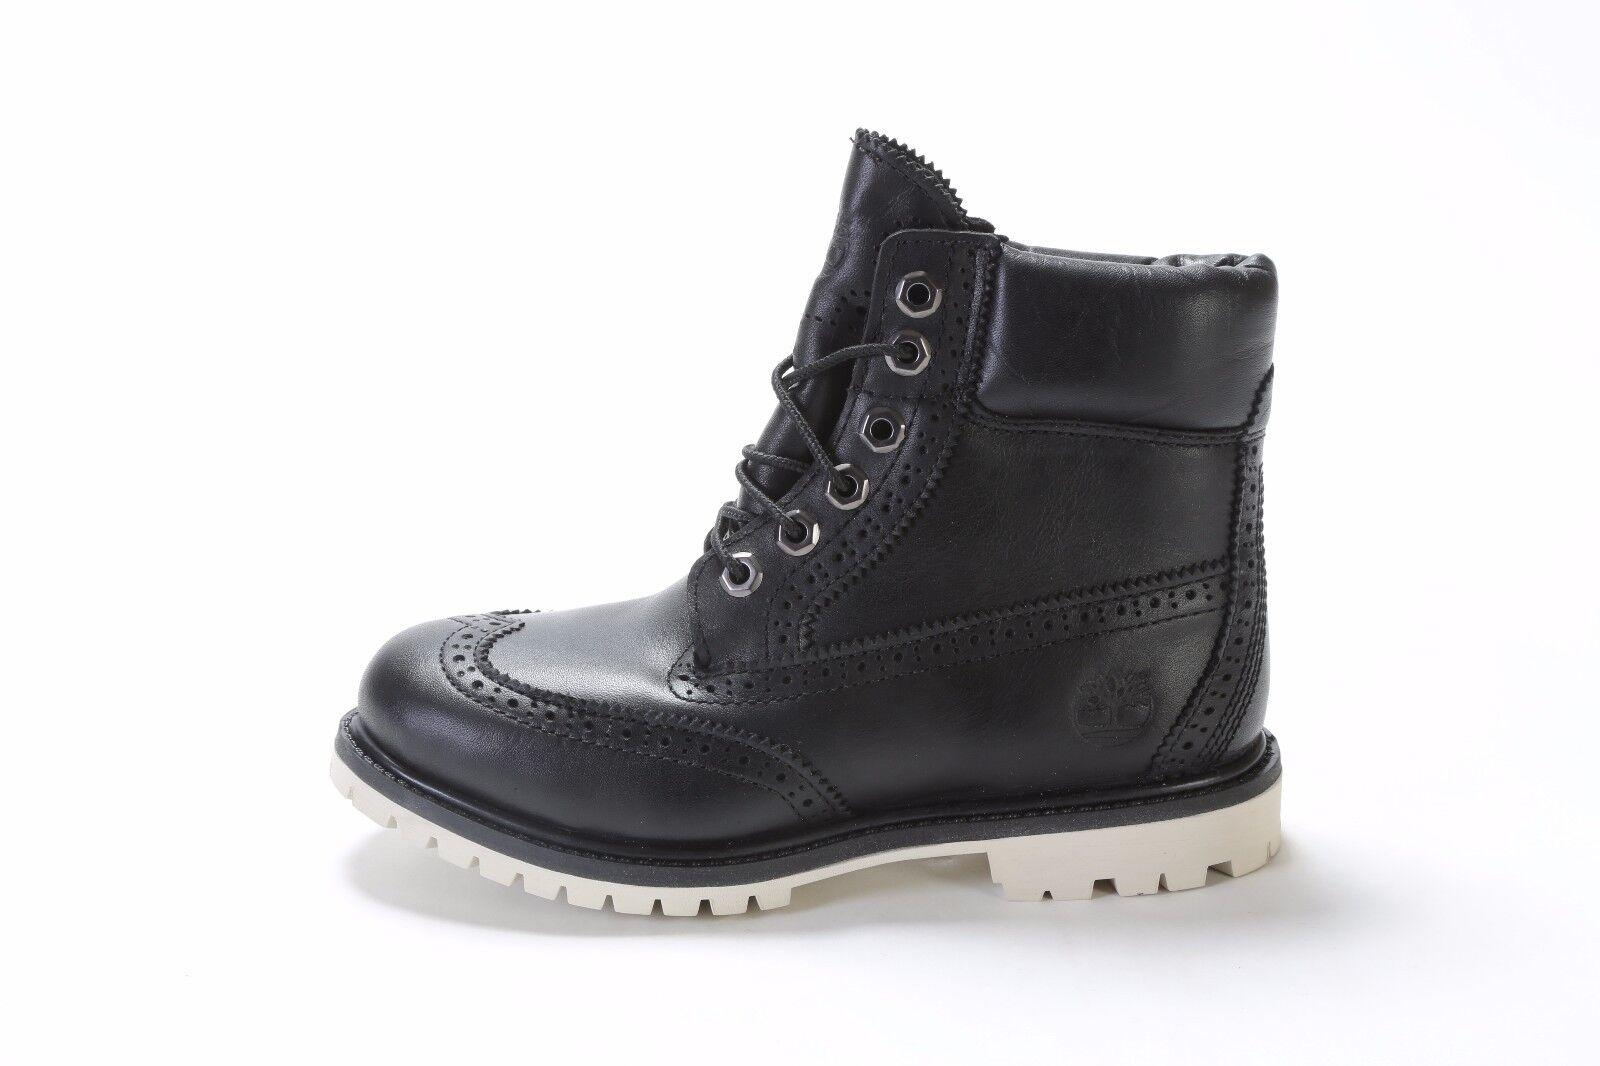 "TIMBERLAND WOMEN'S 6"" PREMIUM BROGUE BOOTS (M) A1G75 BLACK (msrp: $220)"